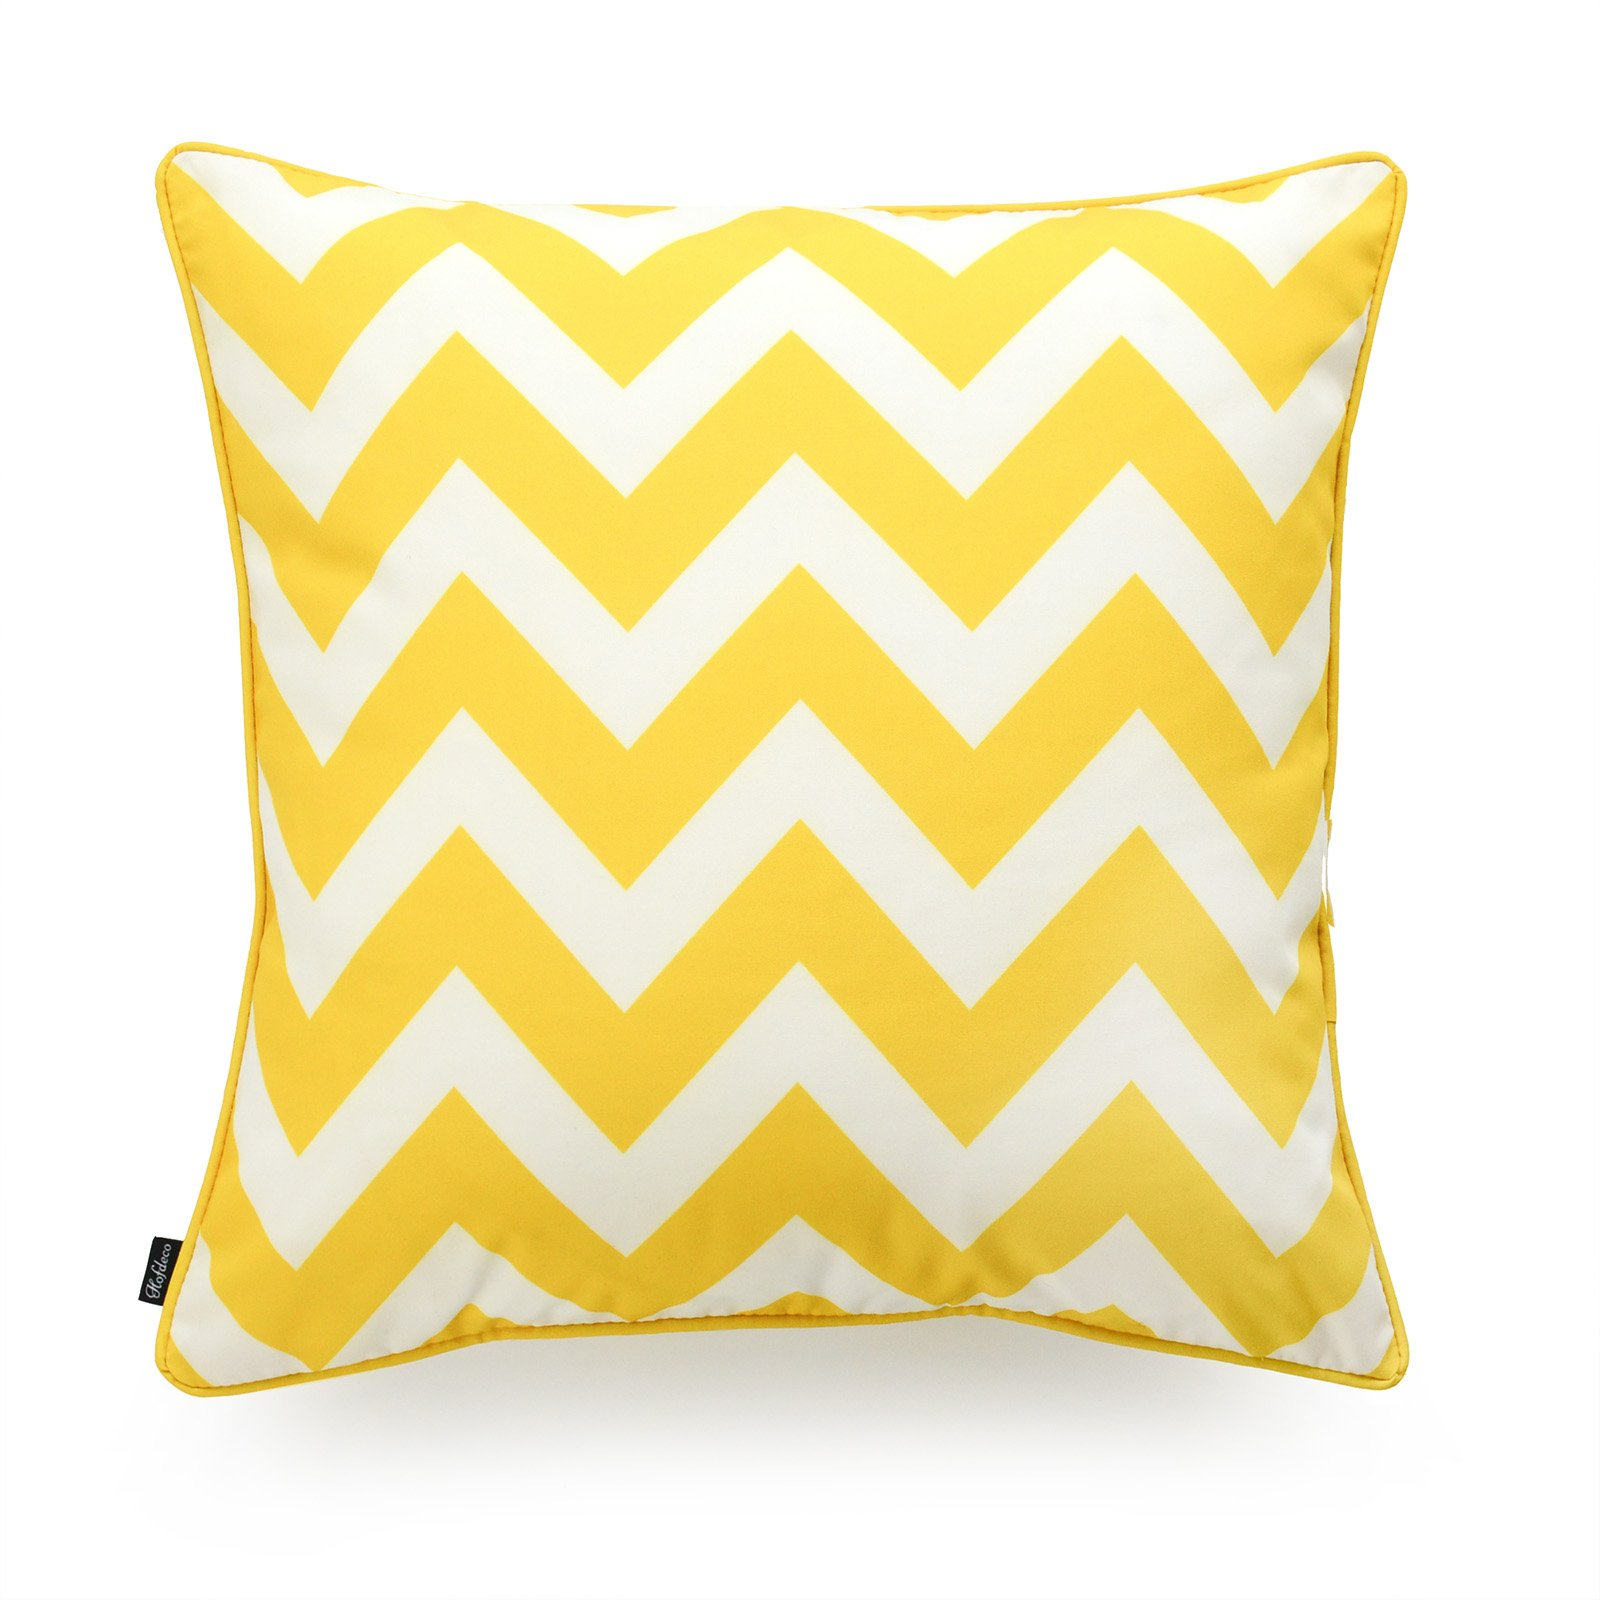 Hofdeco Decorative Throw Pillow Cover INDOOR OUTDOOR WATER RESISTANT Canvas Vibrant Yellow Zigzag Chevron 18''x18''